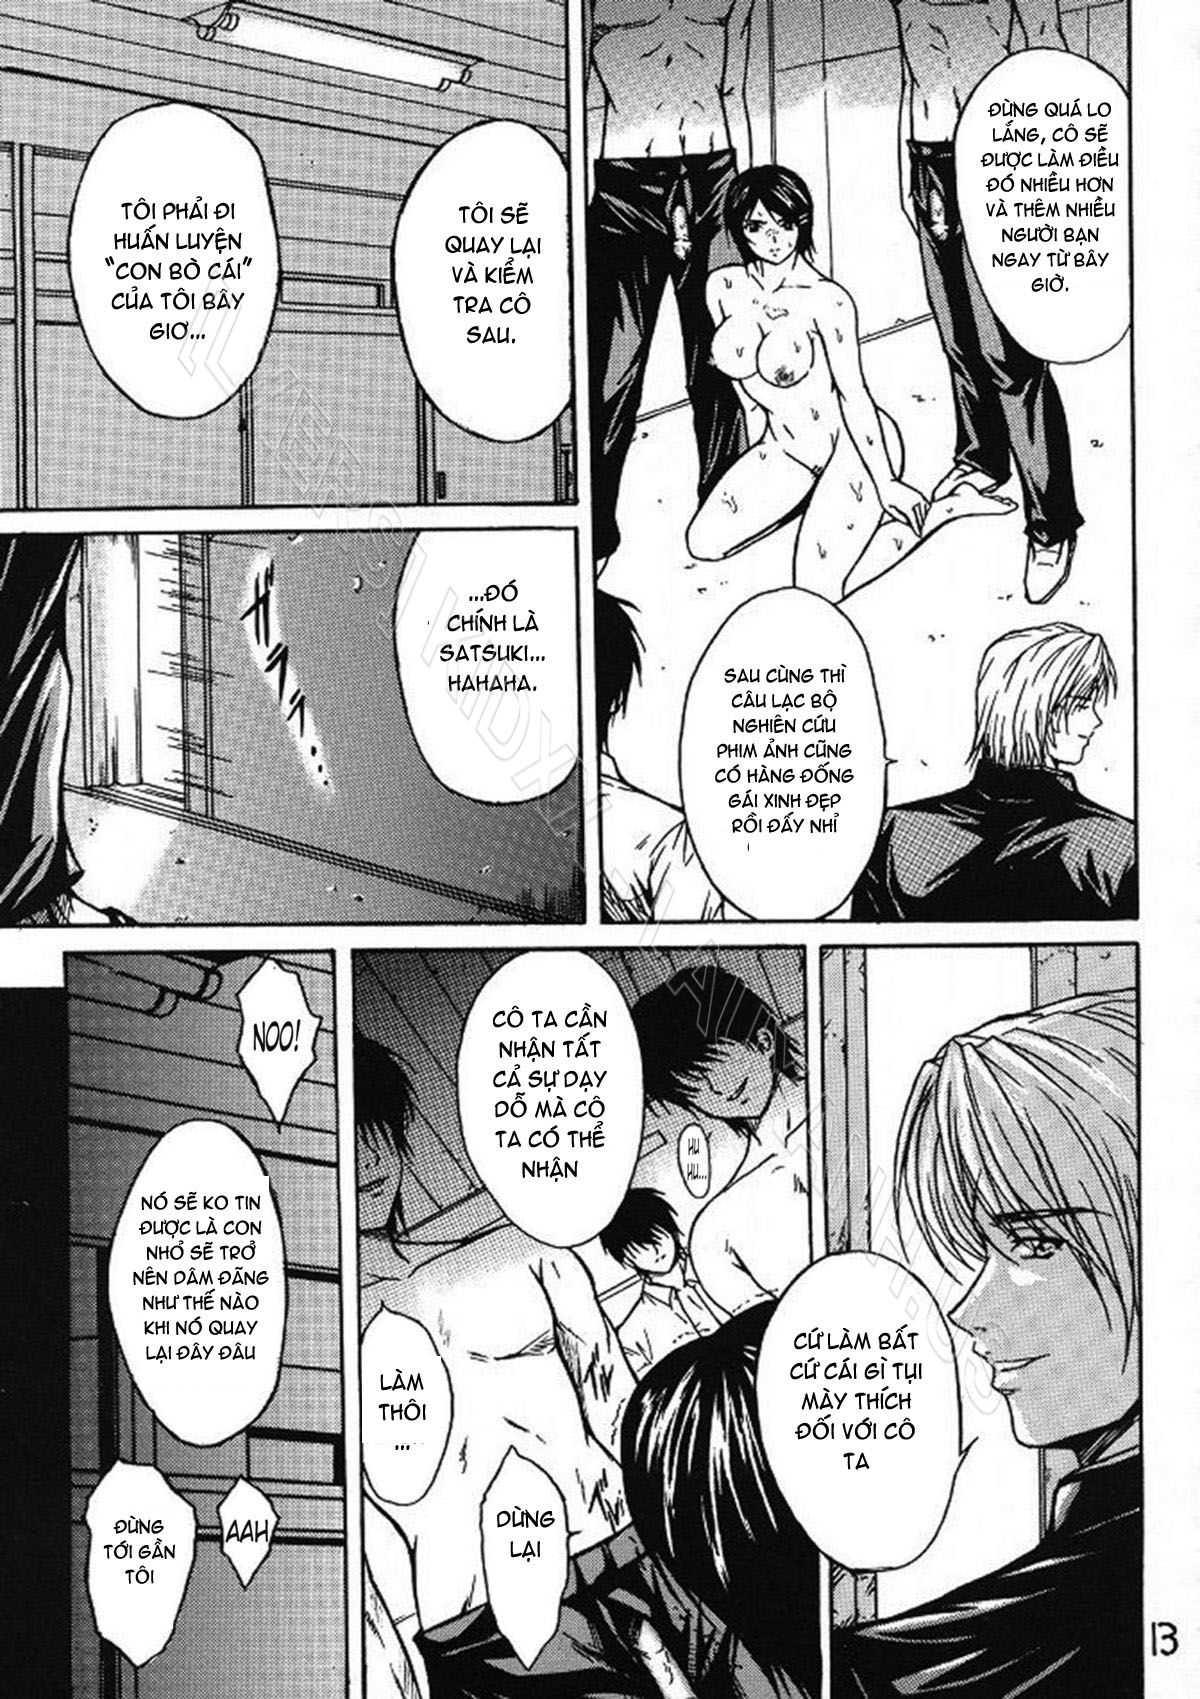 TruyenHay.Com - Ảnh 12 - Ryoujoku Rensa Chapter 2